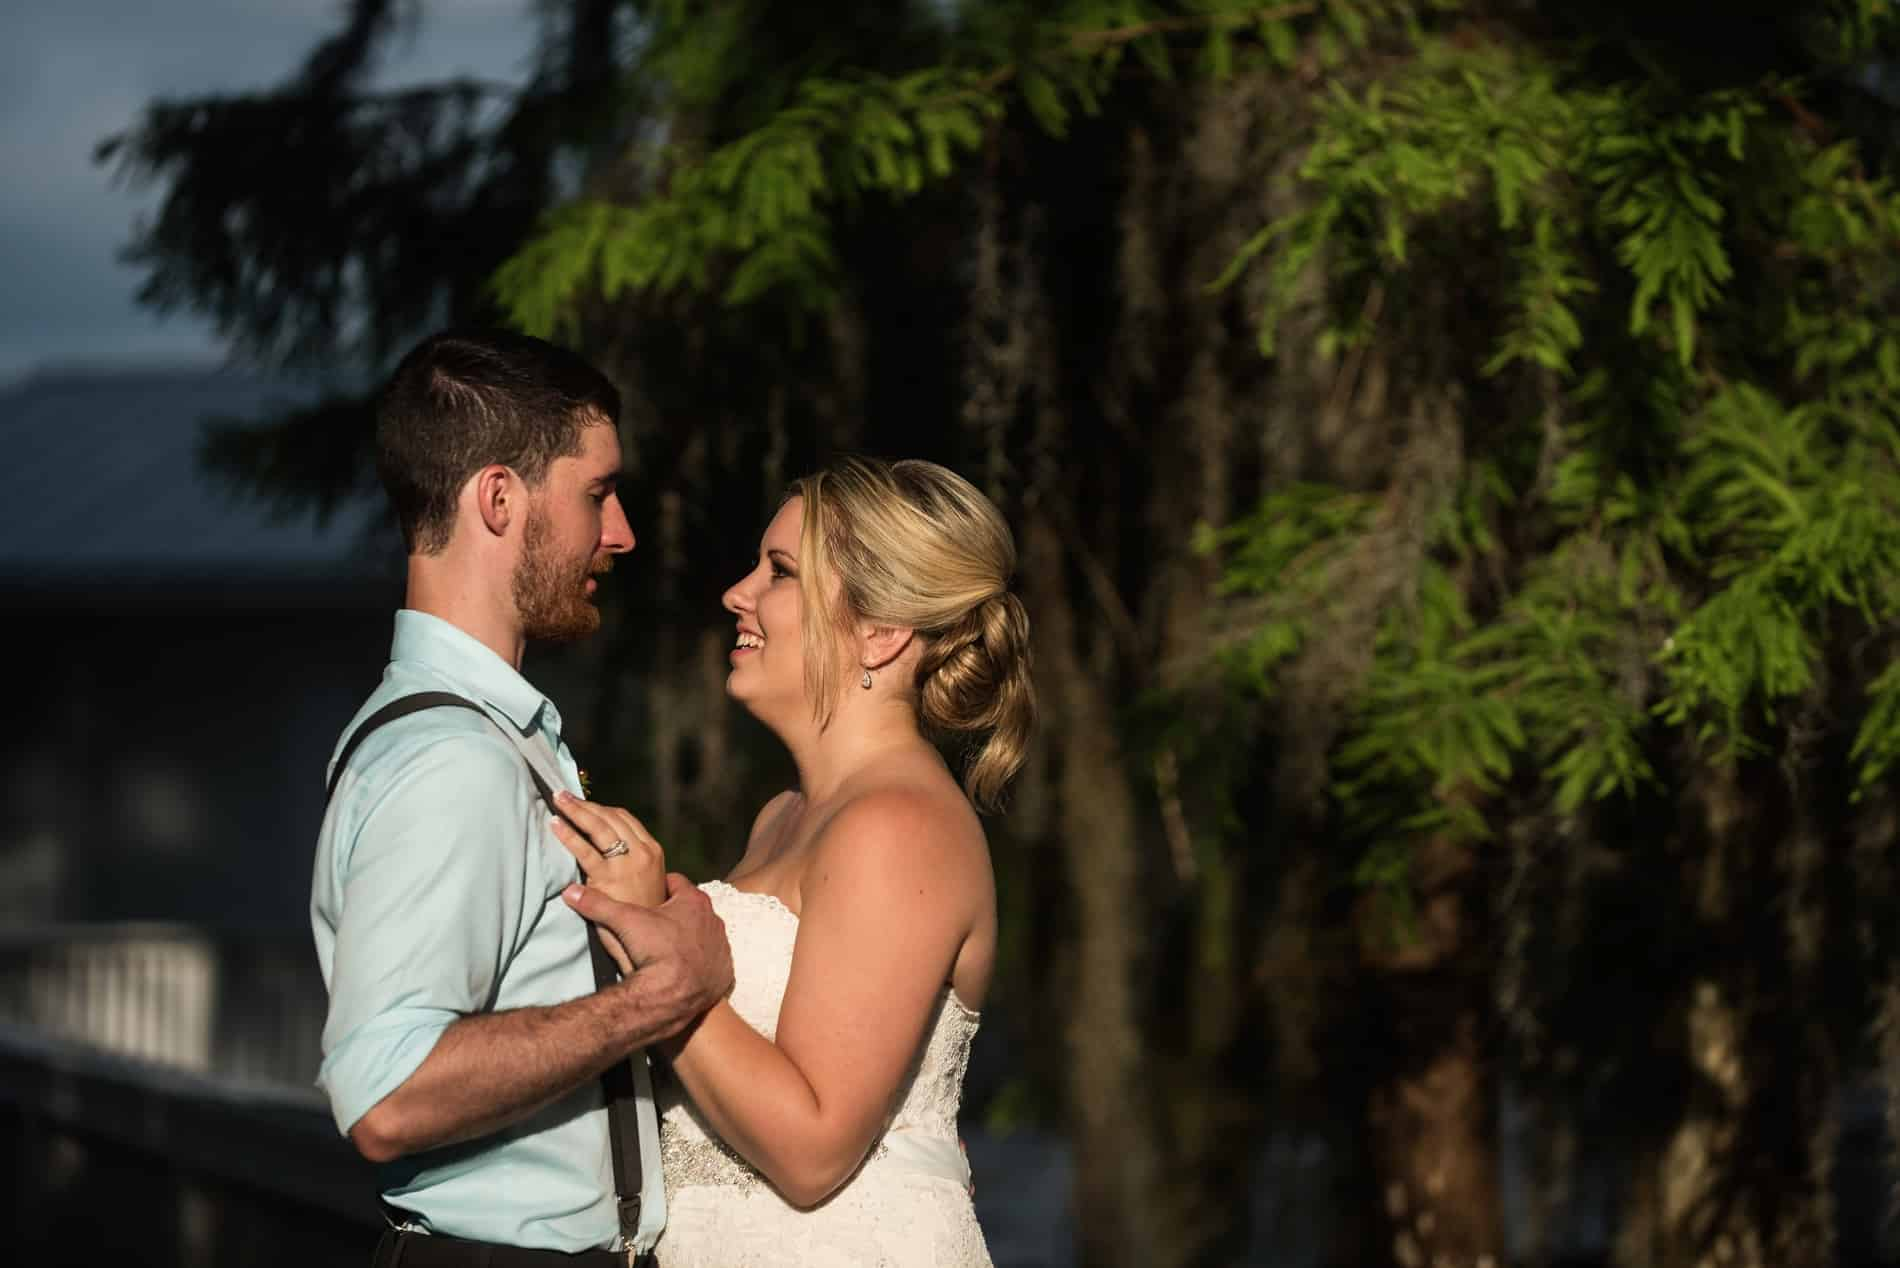 Wedding Photographer Reviews in Orlando